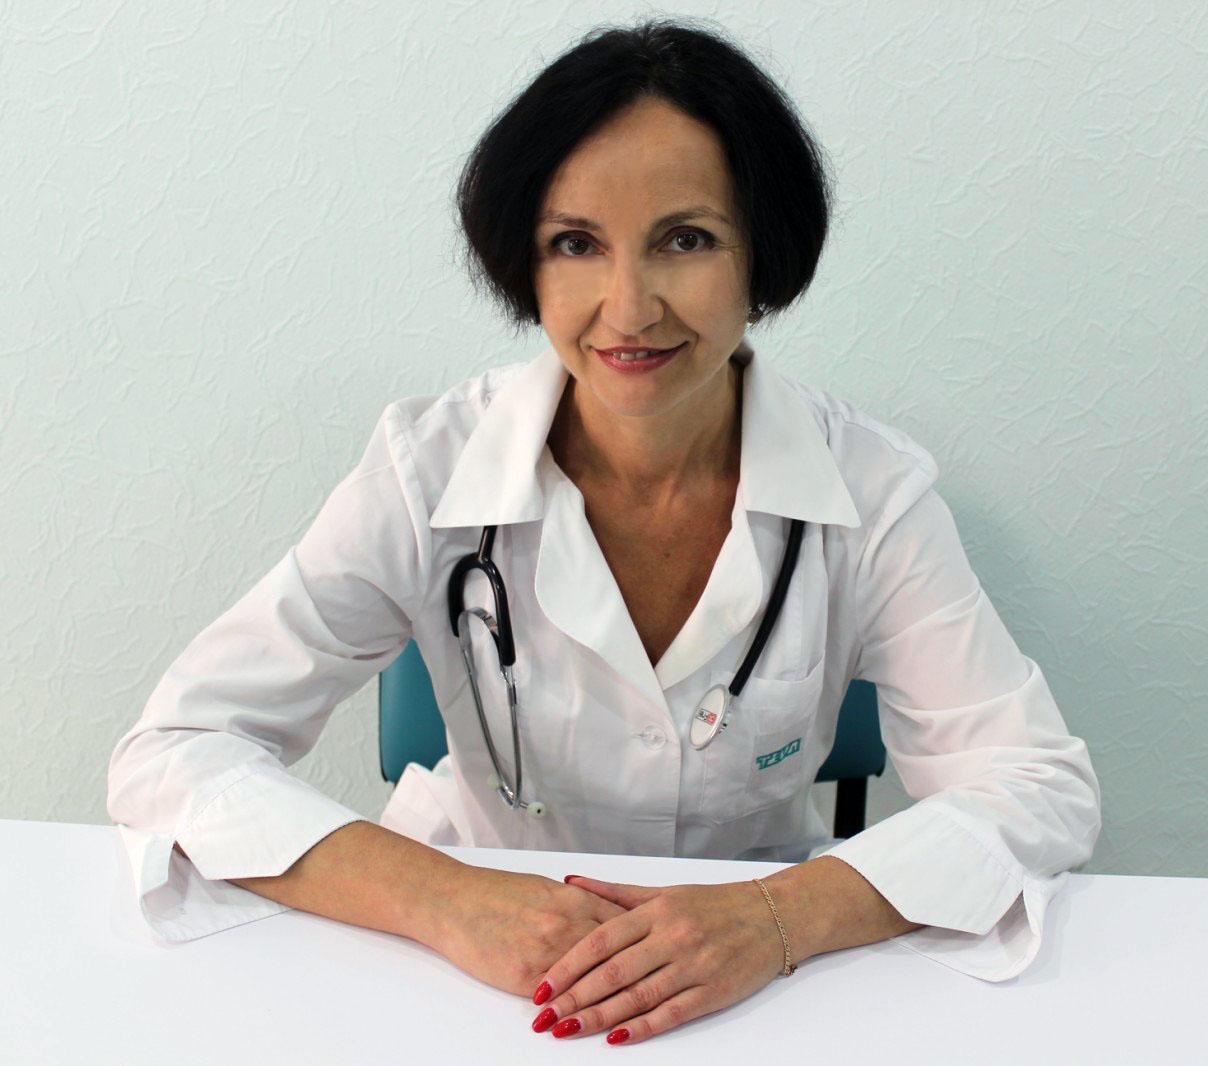 Лікар-кардіолог